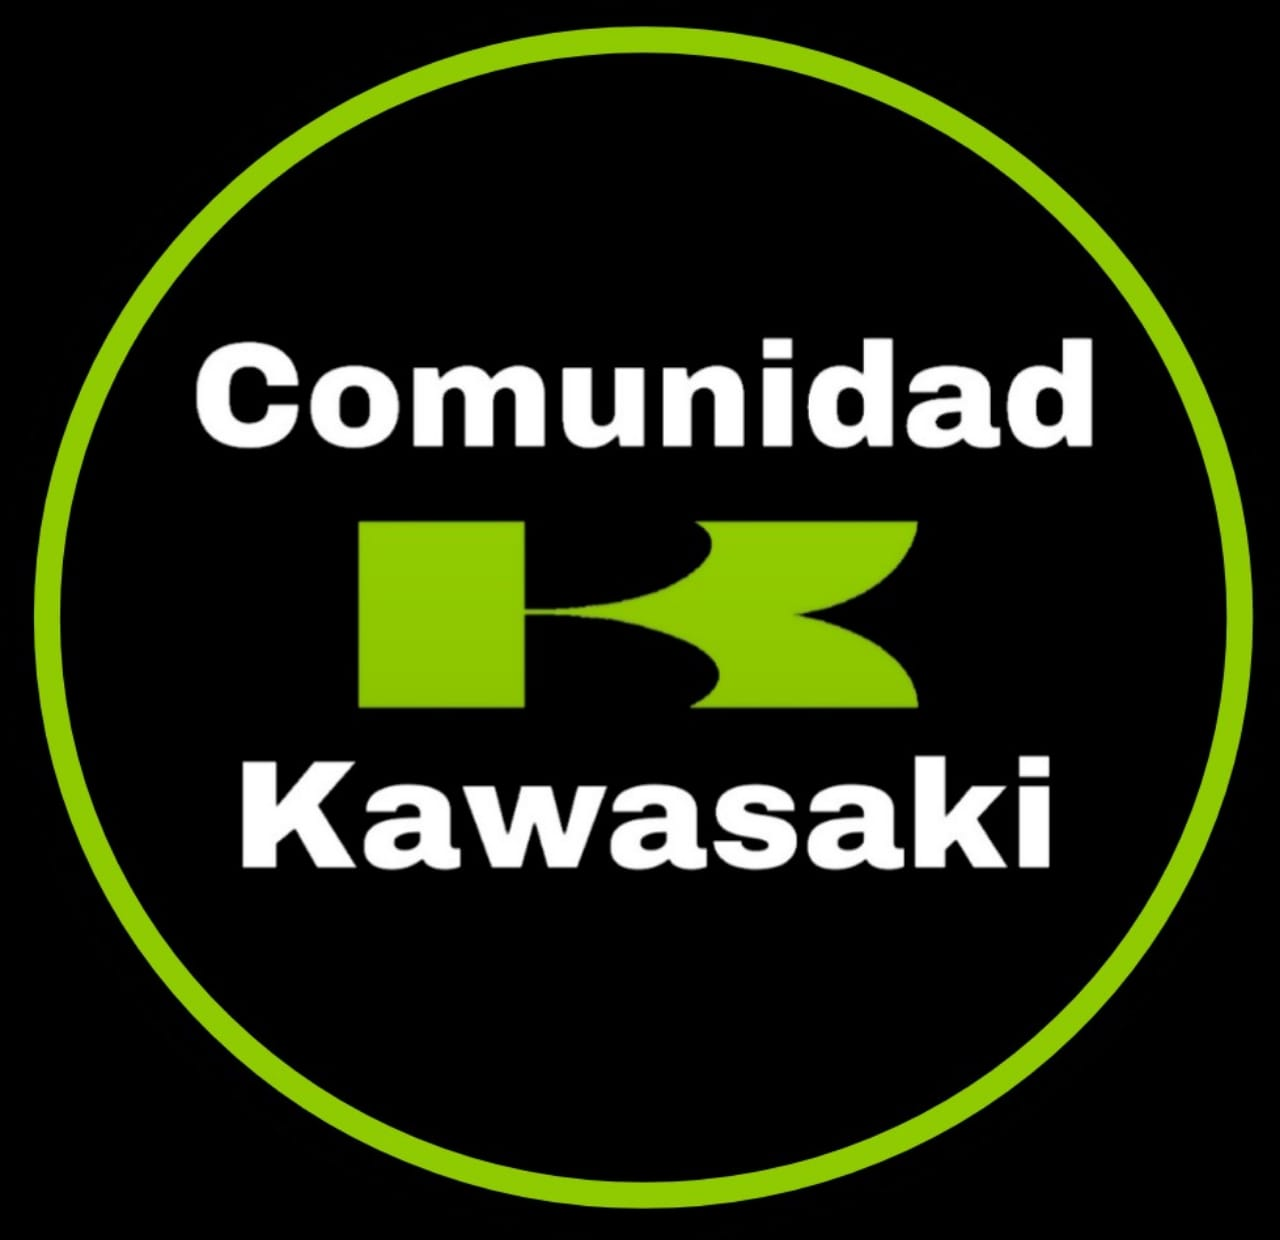 comunidad kawasakijpg